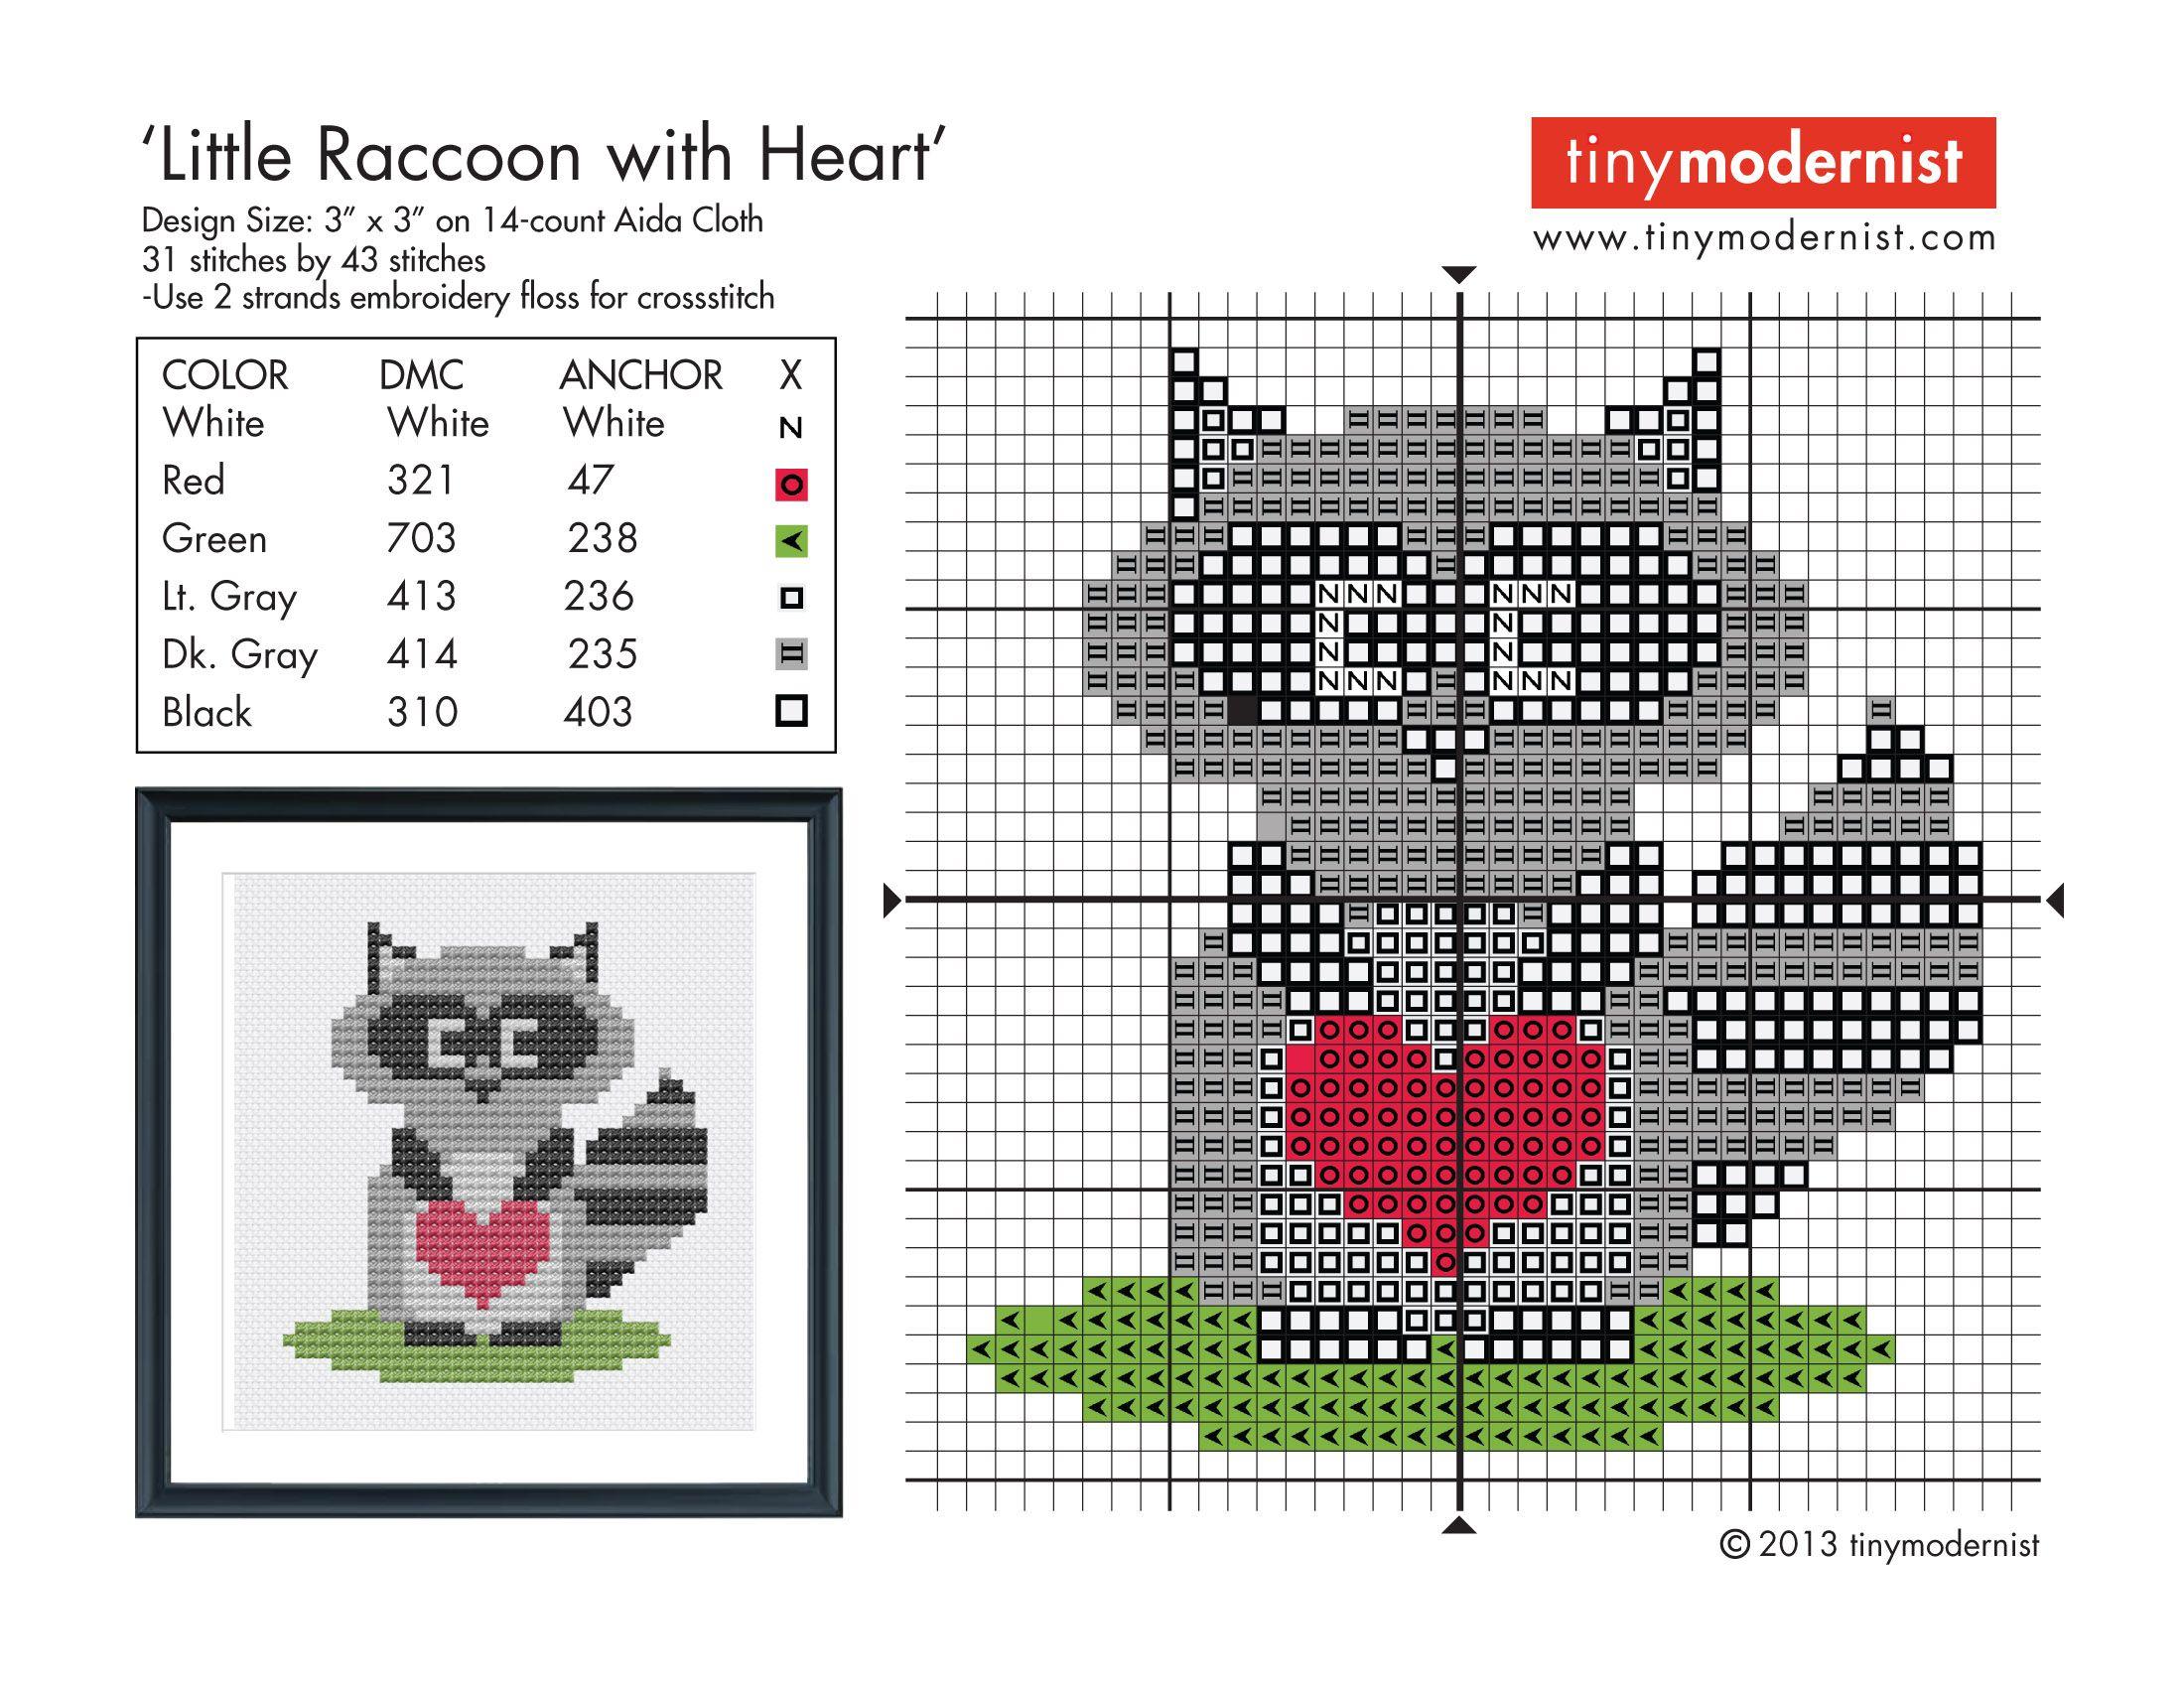 http://tinymodernist.files.wordpress.com/2013/01/raccoon-heart-pattern.jpg